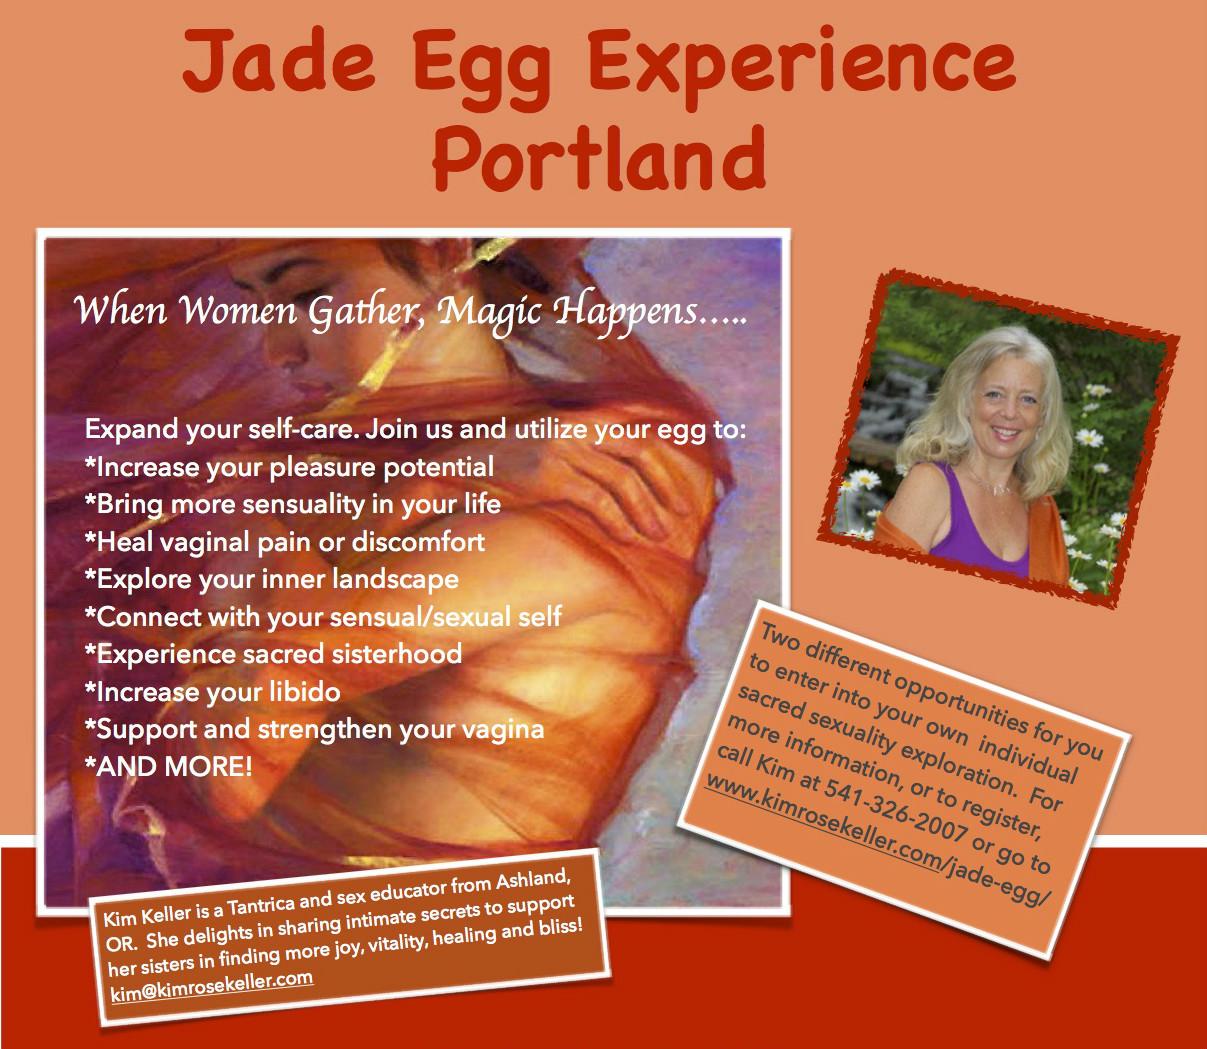 JadeEggExperience